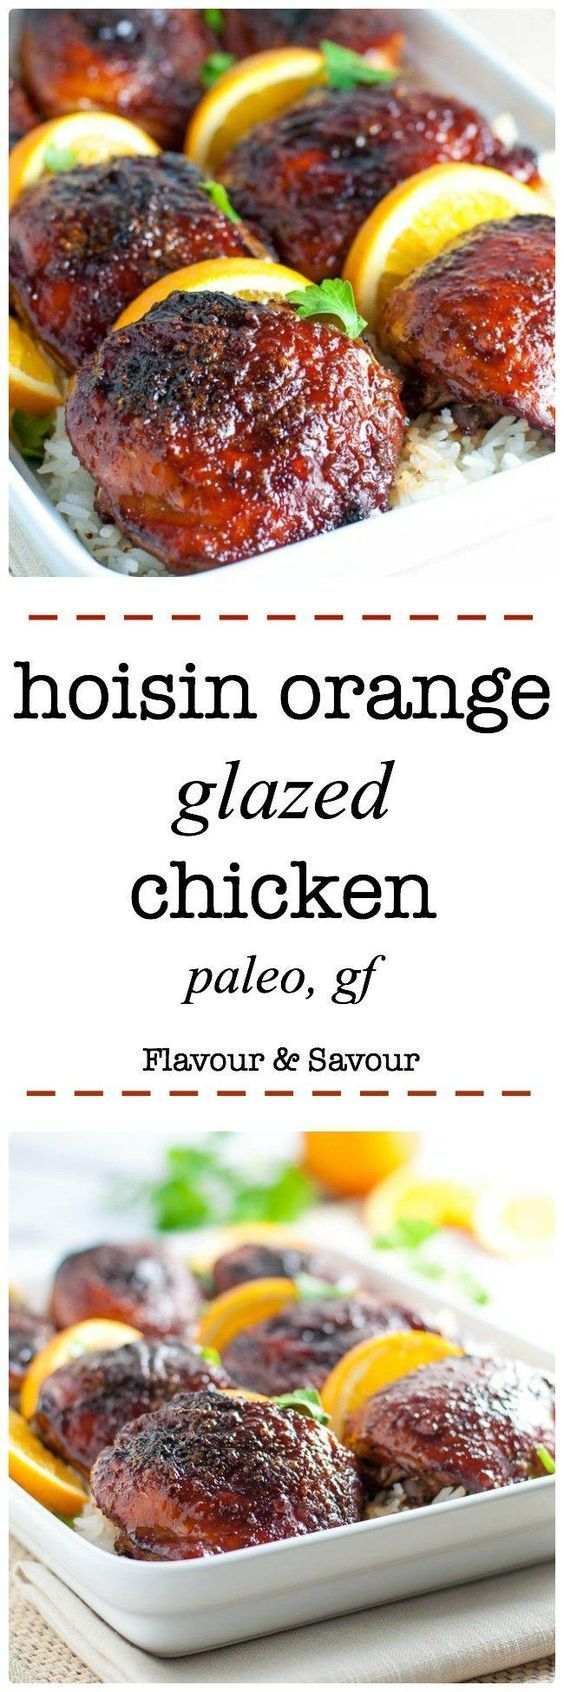 Hoisin Orange Glazed Chicken Thighs. An easy, 5-ingredient glaze for chicken results in succulent, juicy chicken with hints of orange, ginger and garlic. |www.flavourandsavour.com